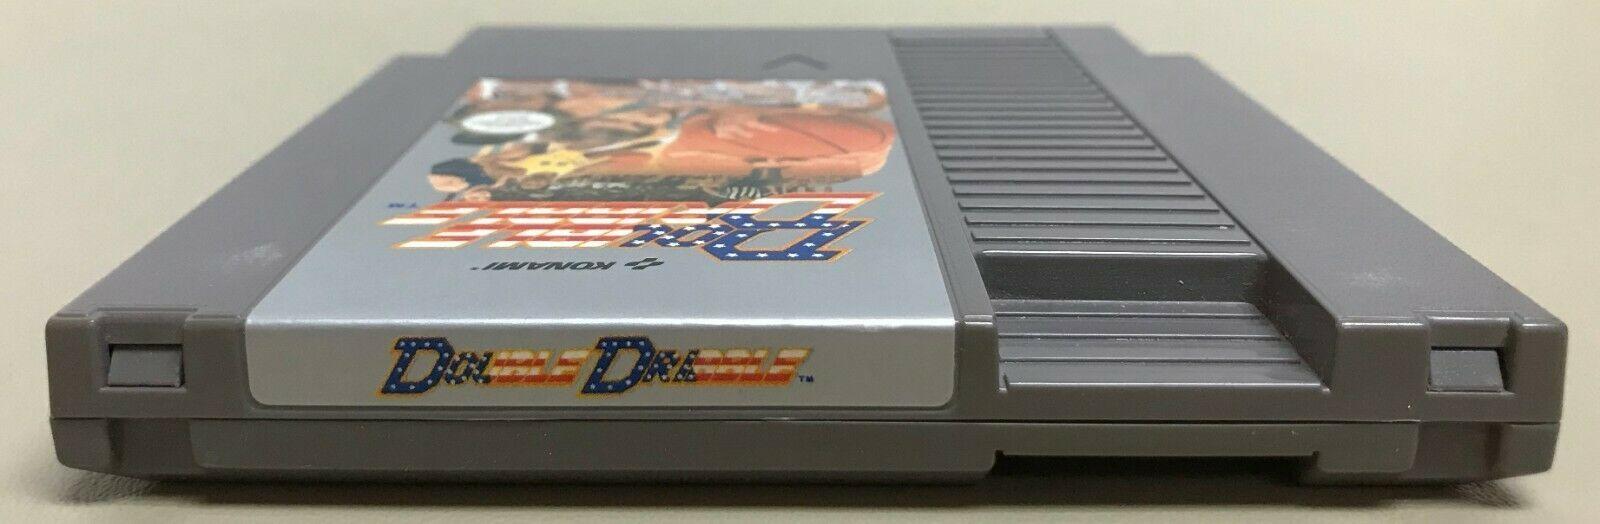 Blades of Steel, Top Gun, Double Dribble 3 NES Konami Game Lot Nintendo image 10